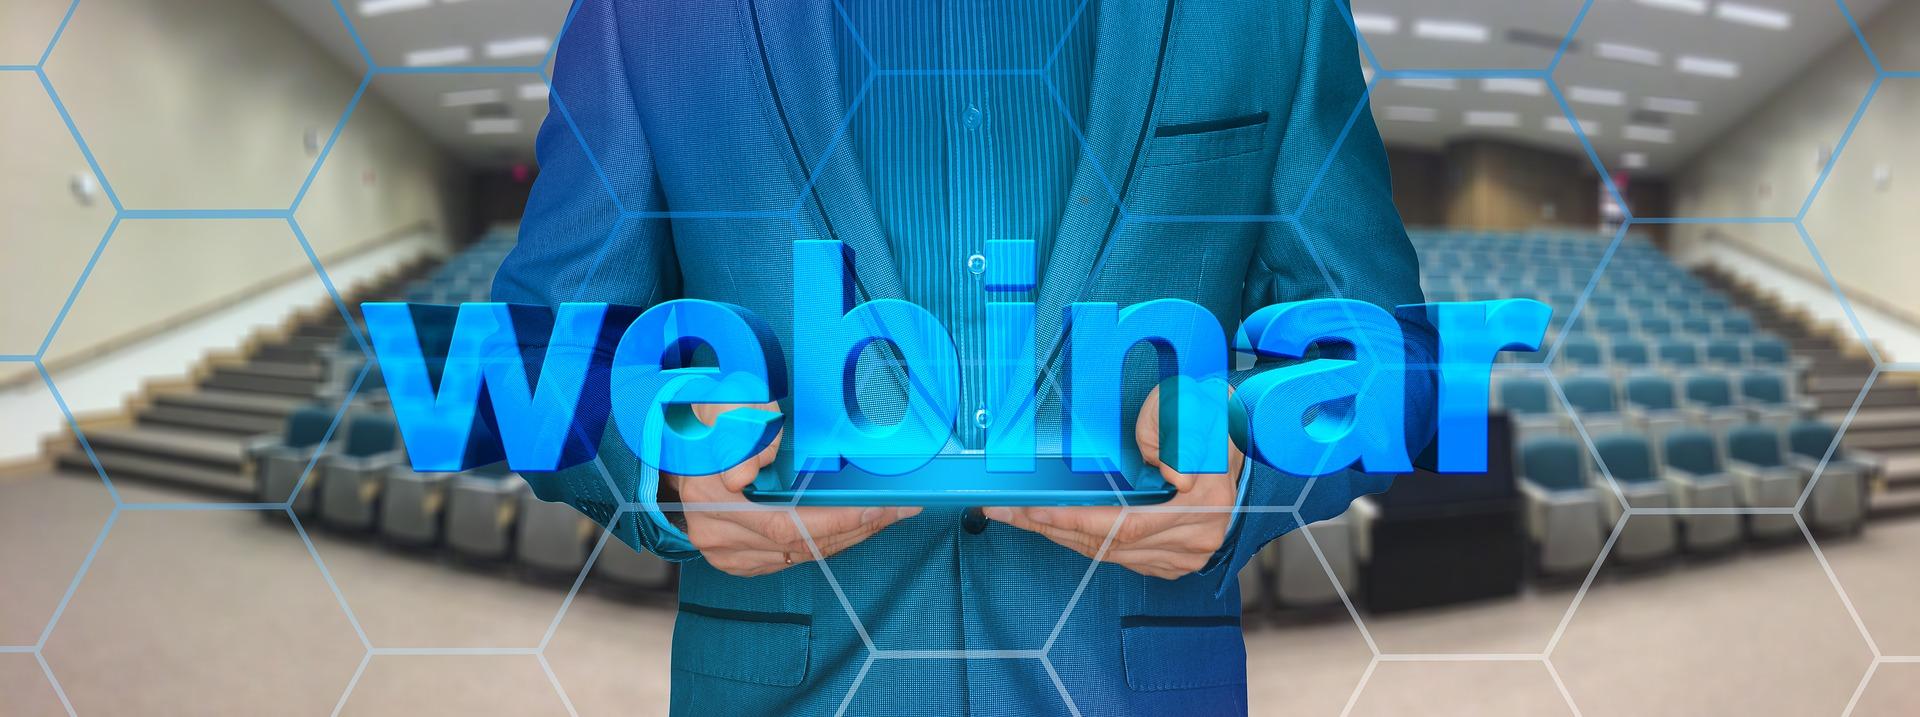 WEDnesday Webinar Series -